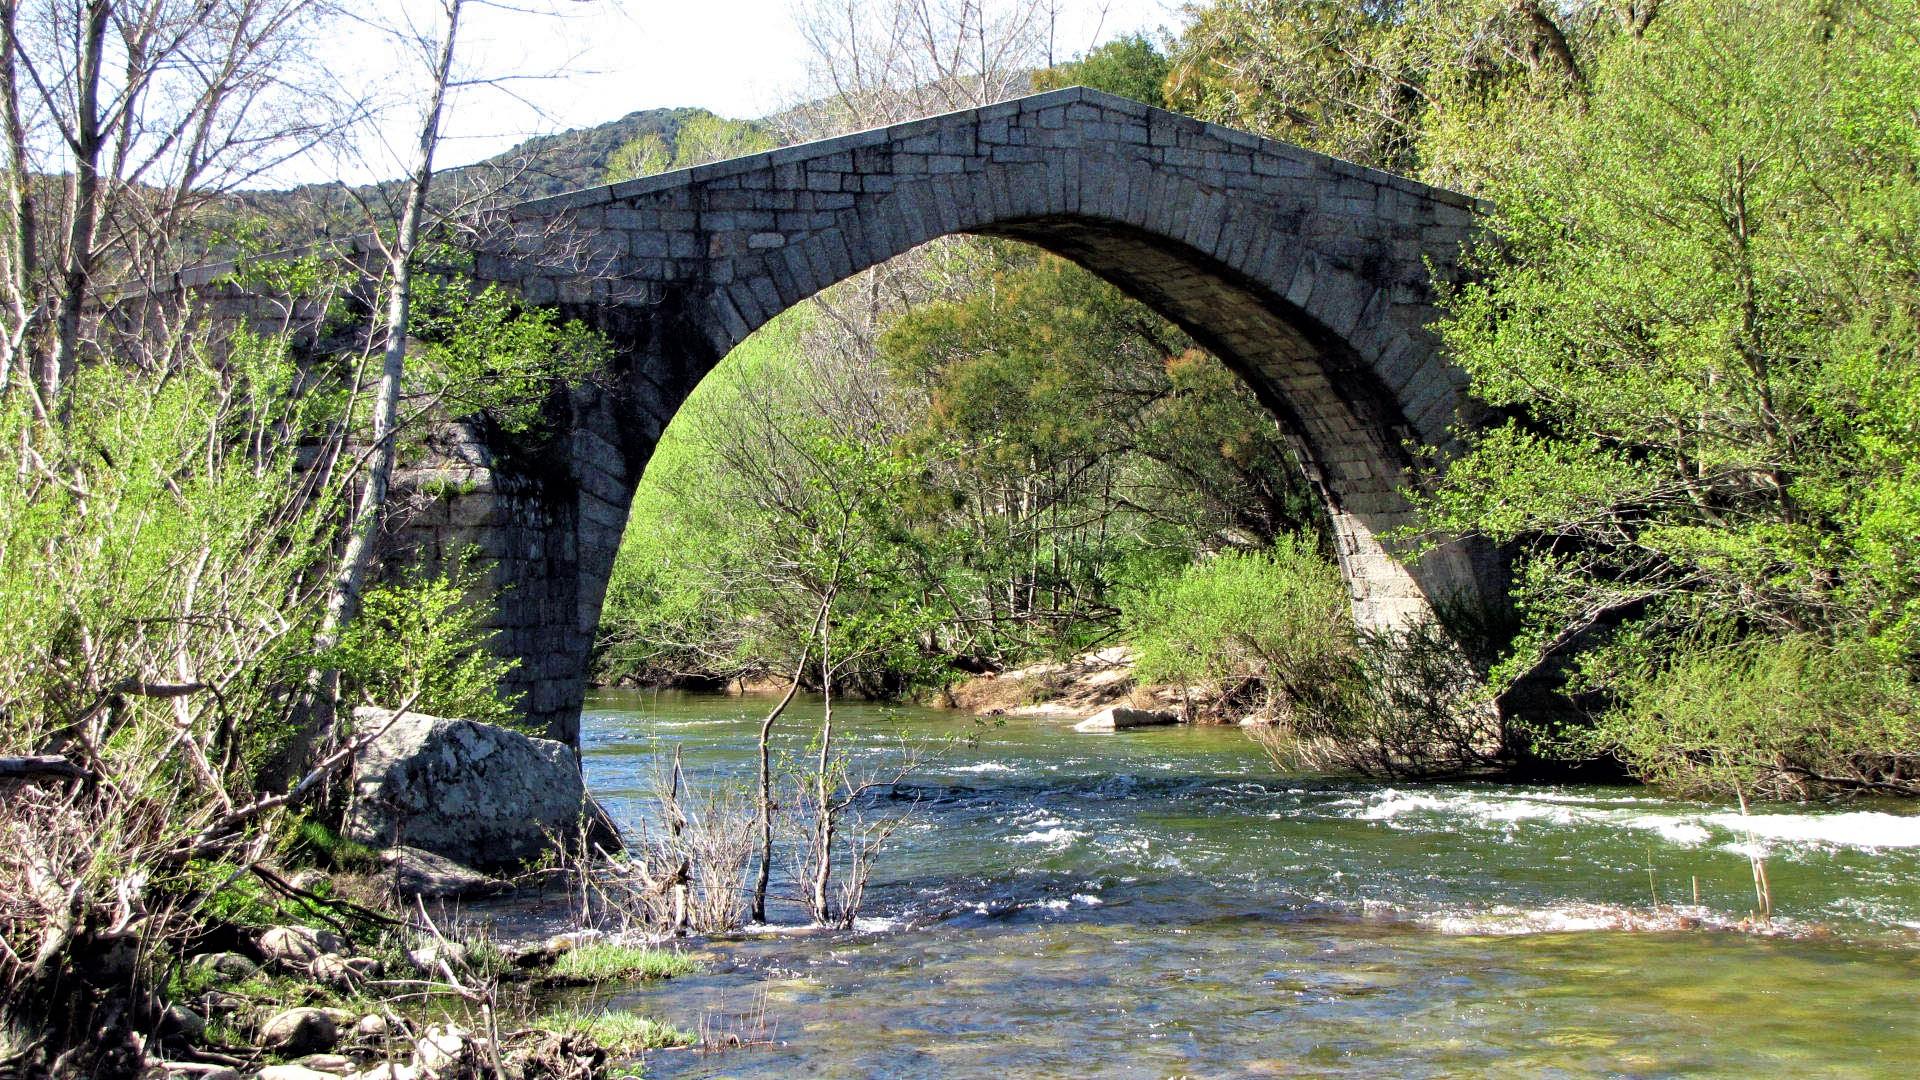 Genoese bridge - Spin'a Cavaddu